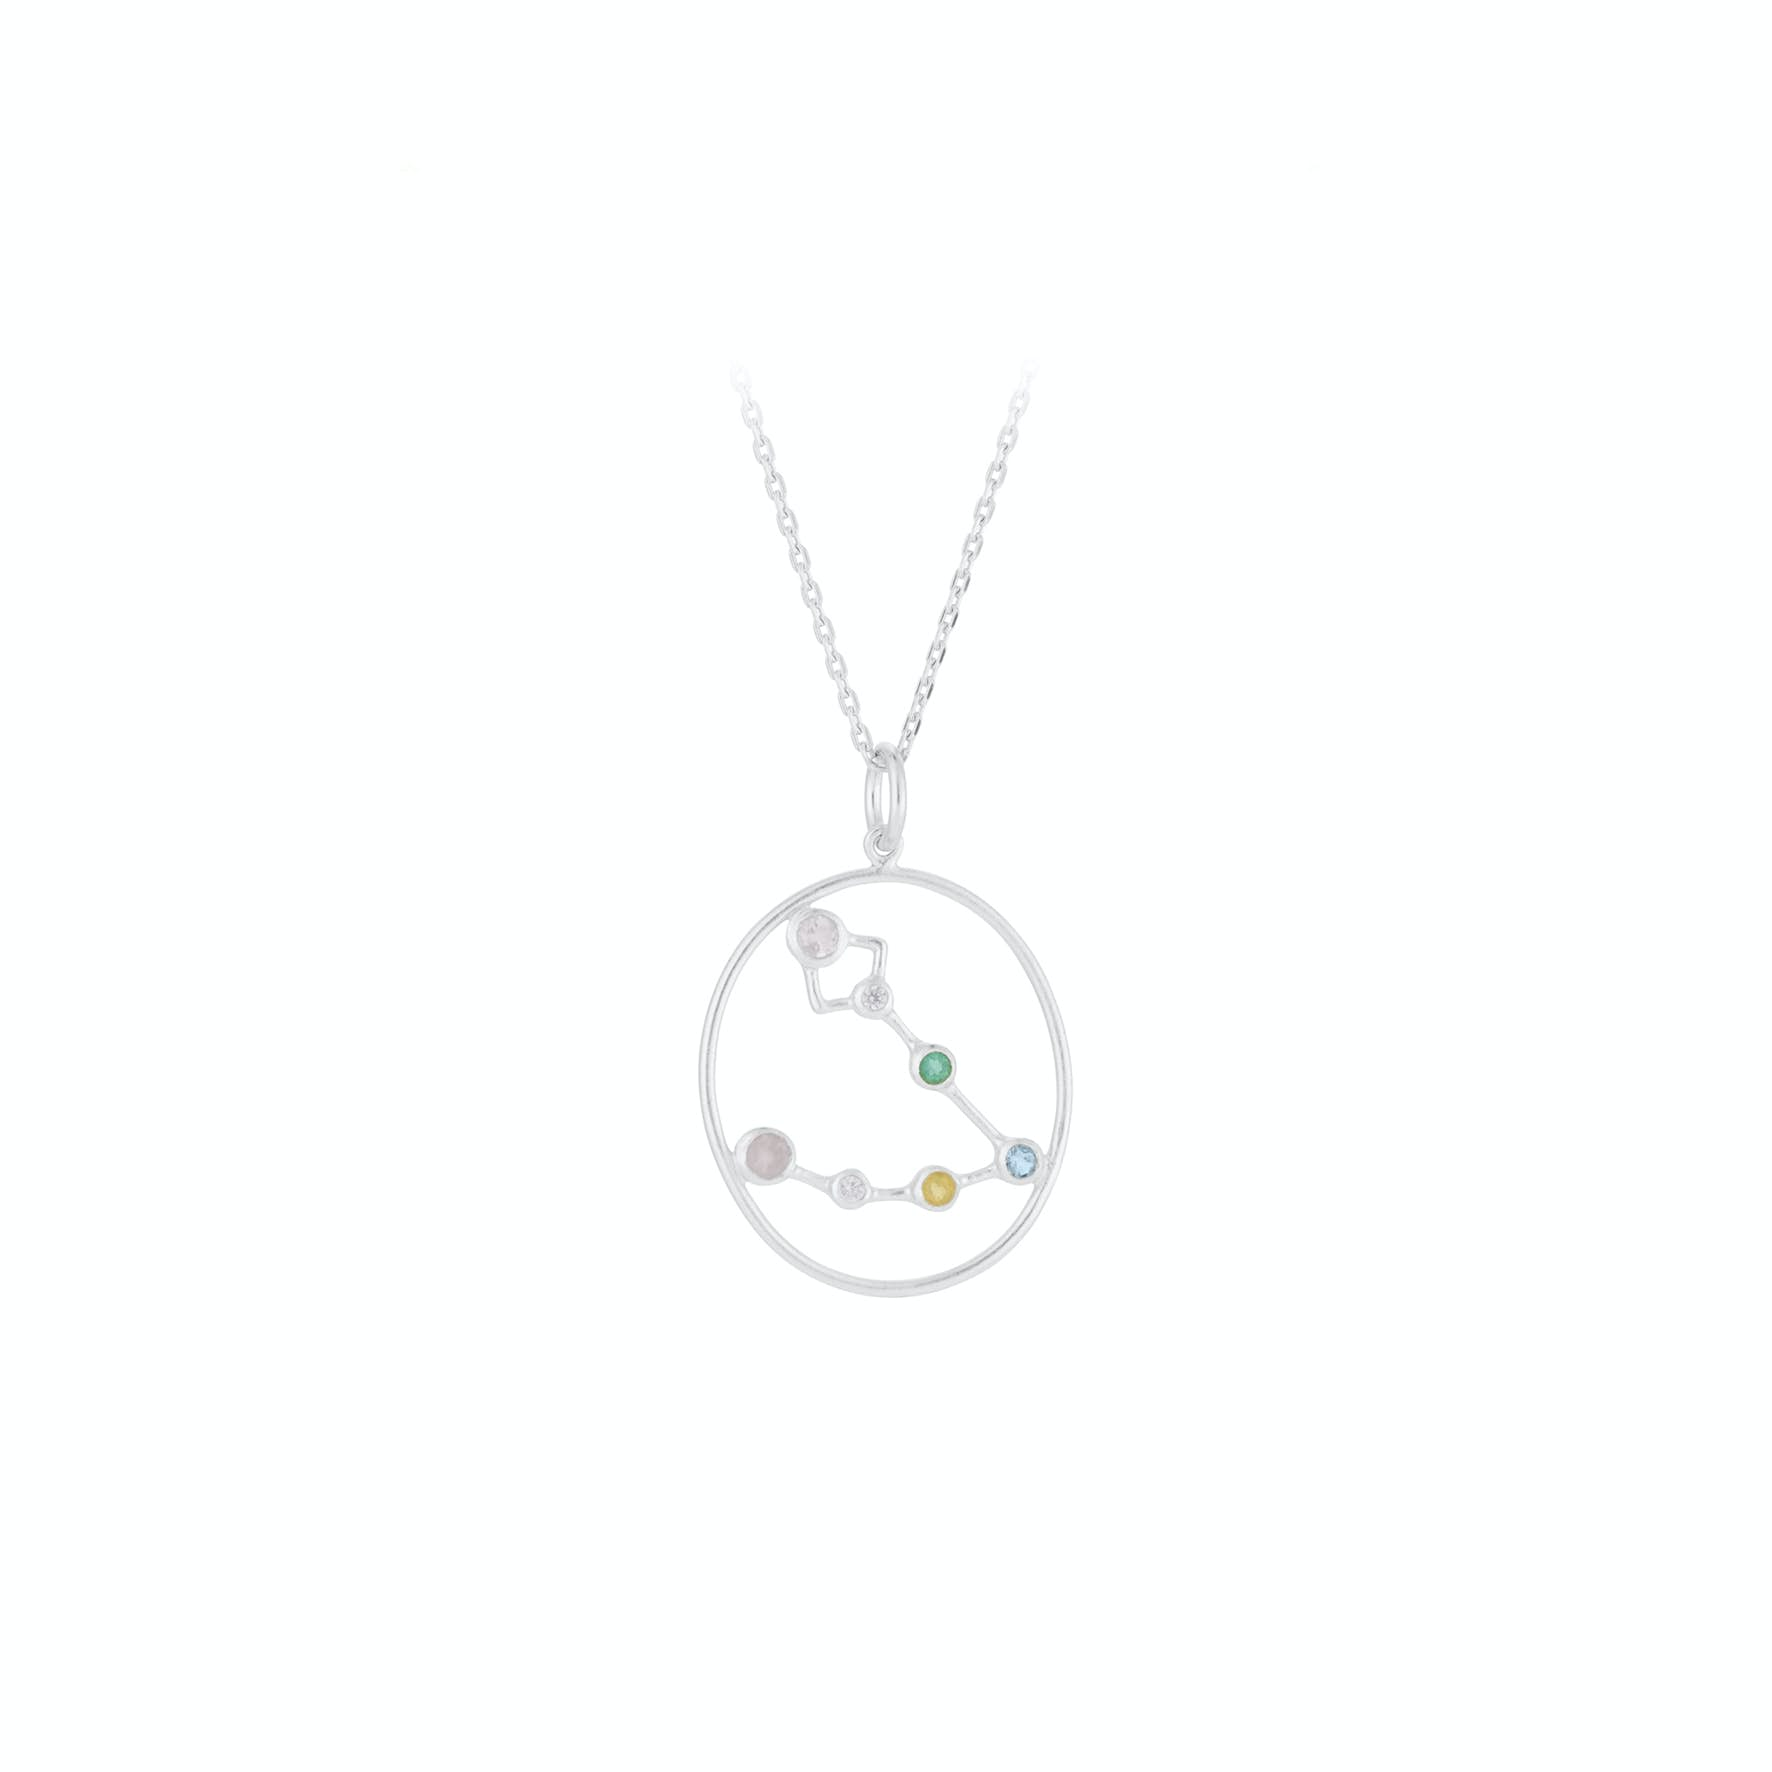 Zodiac Pisces Necklace (Feb 19 - Mar 20) von Pernille Corydon in Silber Sterling 925